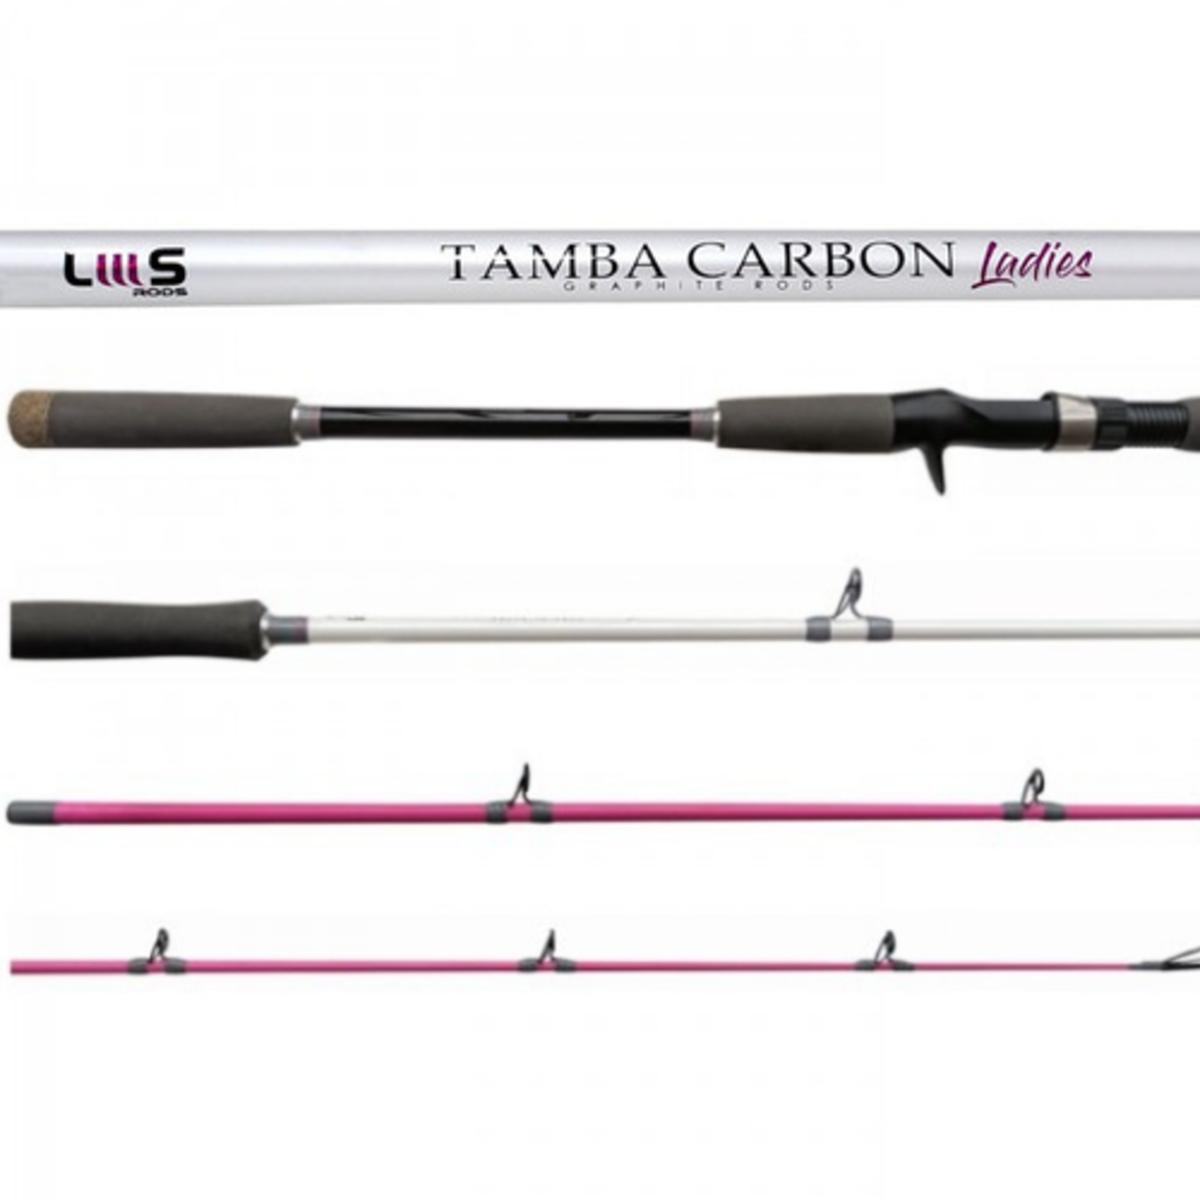 Vara Lumis Tamba Carbon Rosa 8'0 (2,40m) 20-50lb Carretilha 2 Partes